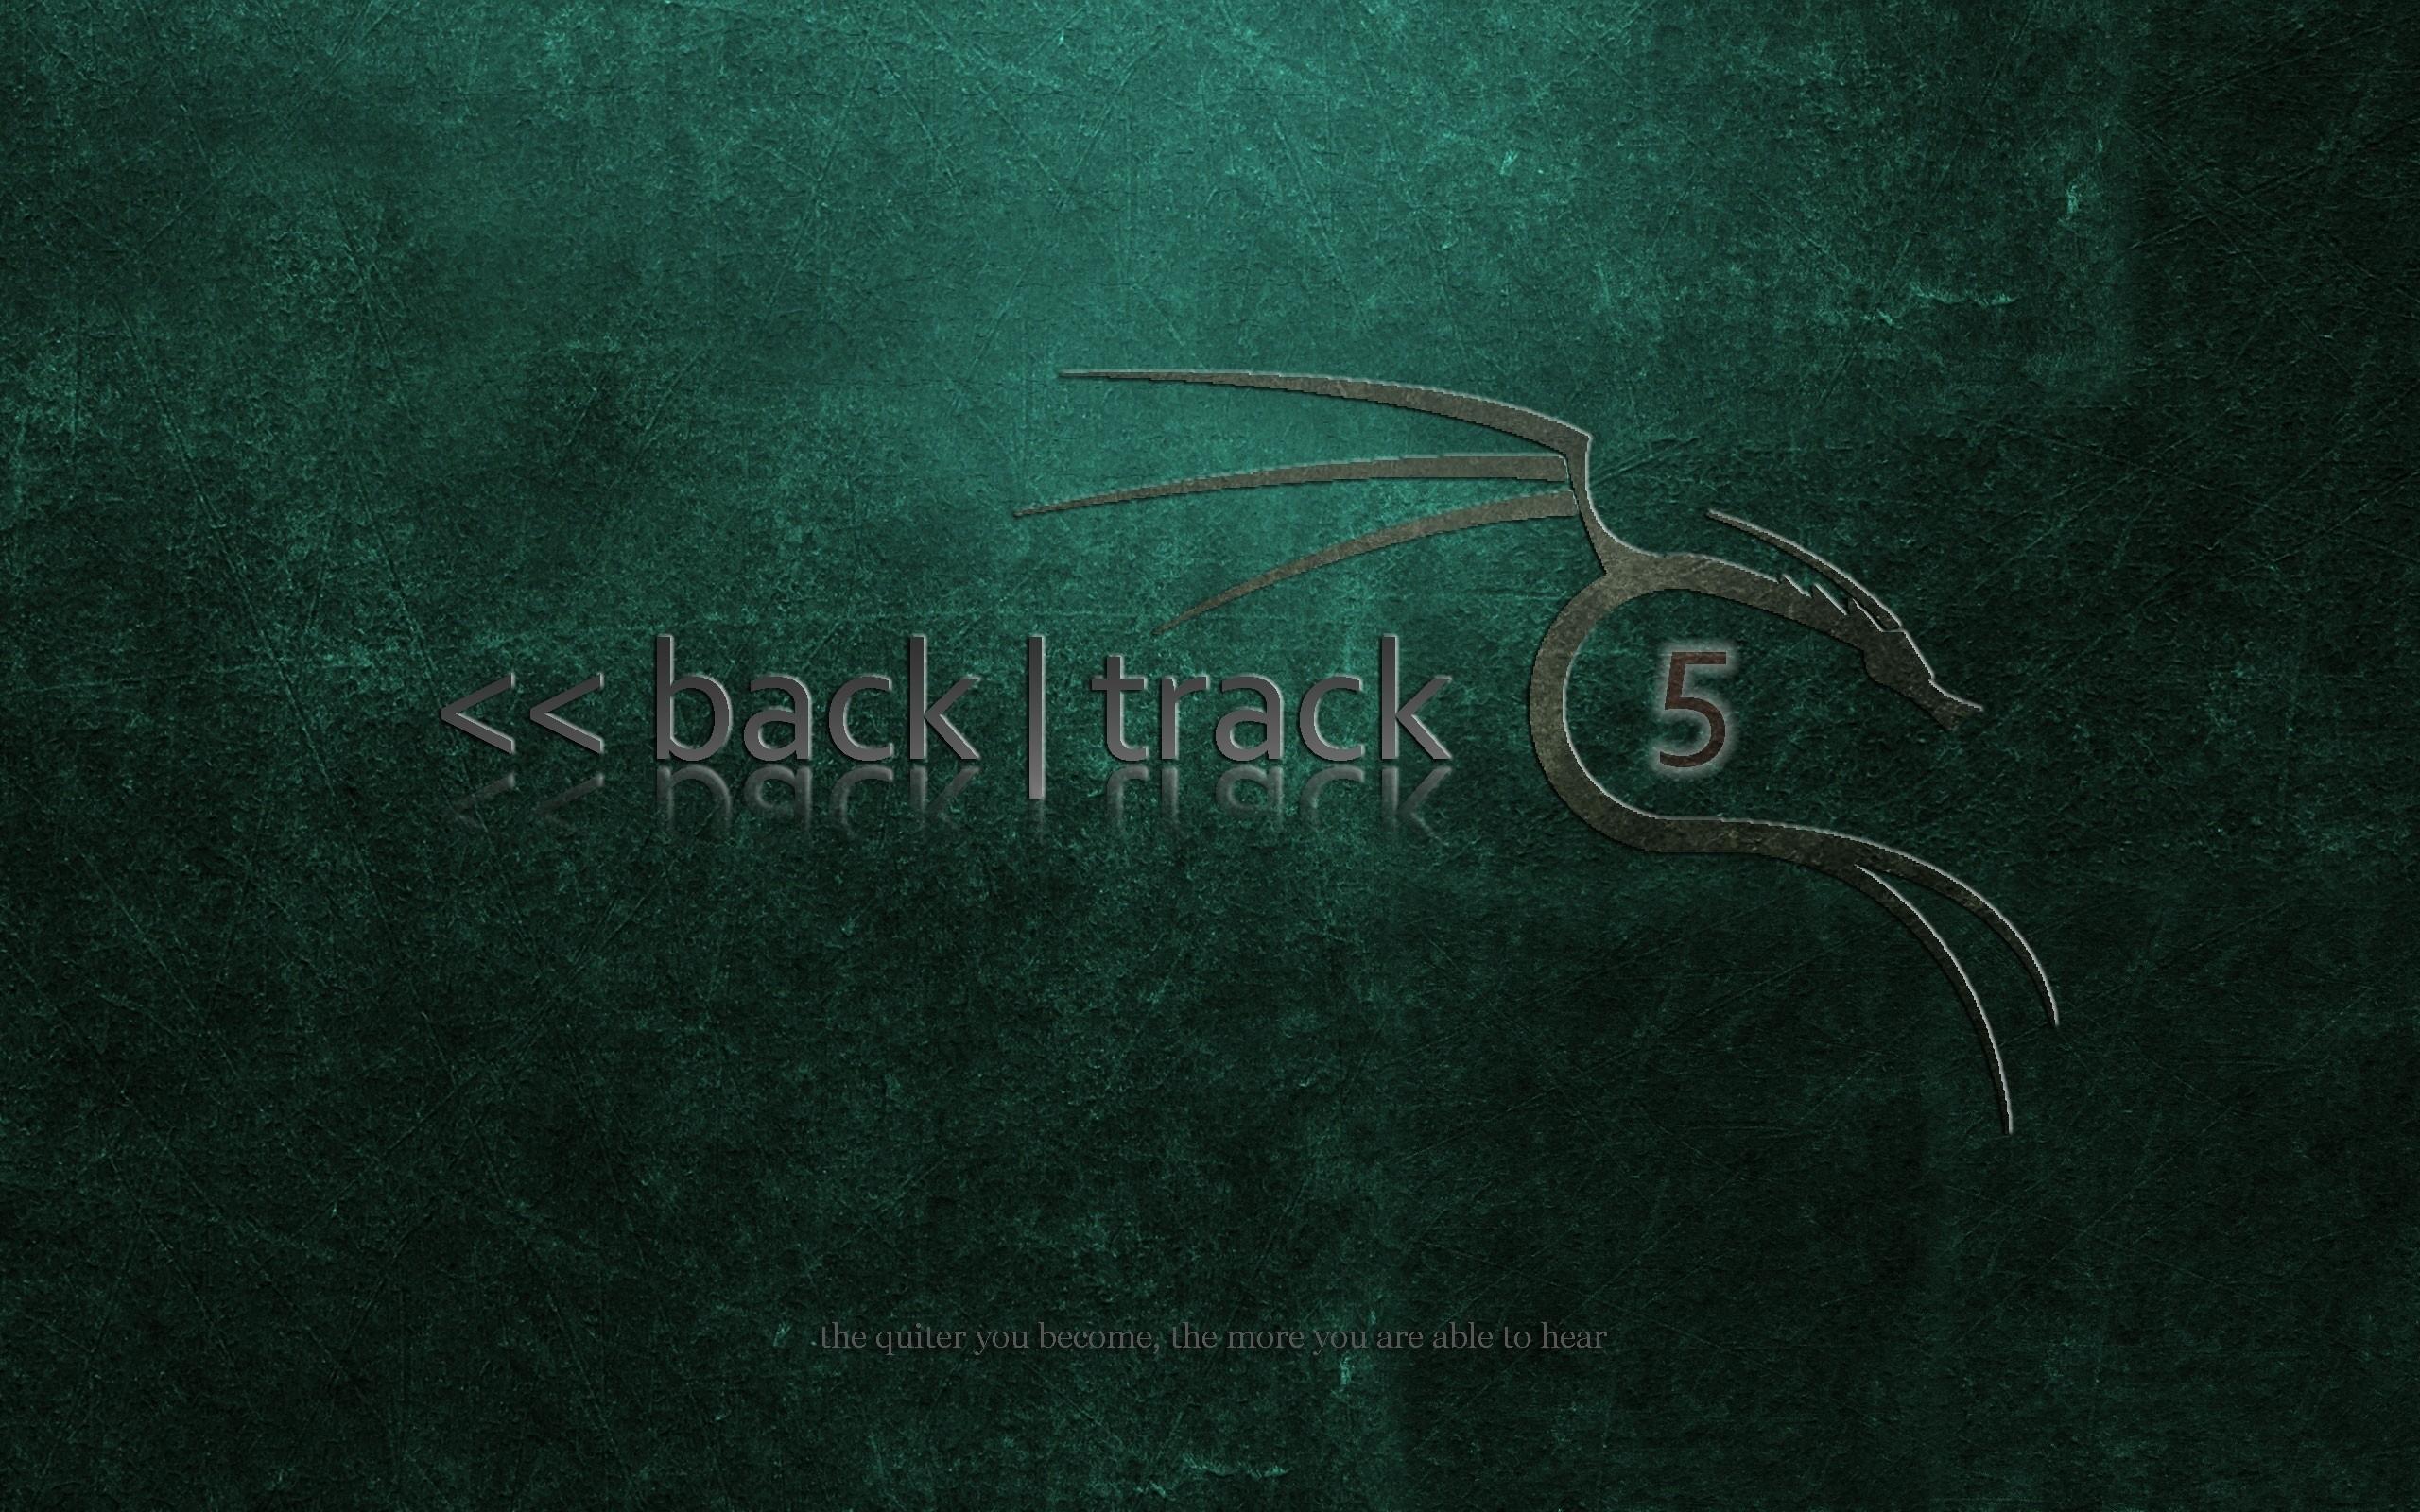 Backtrack Wallpaper (61+ images)